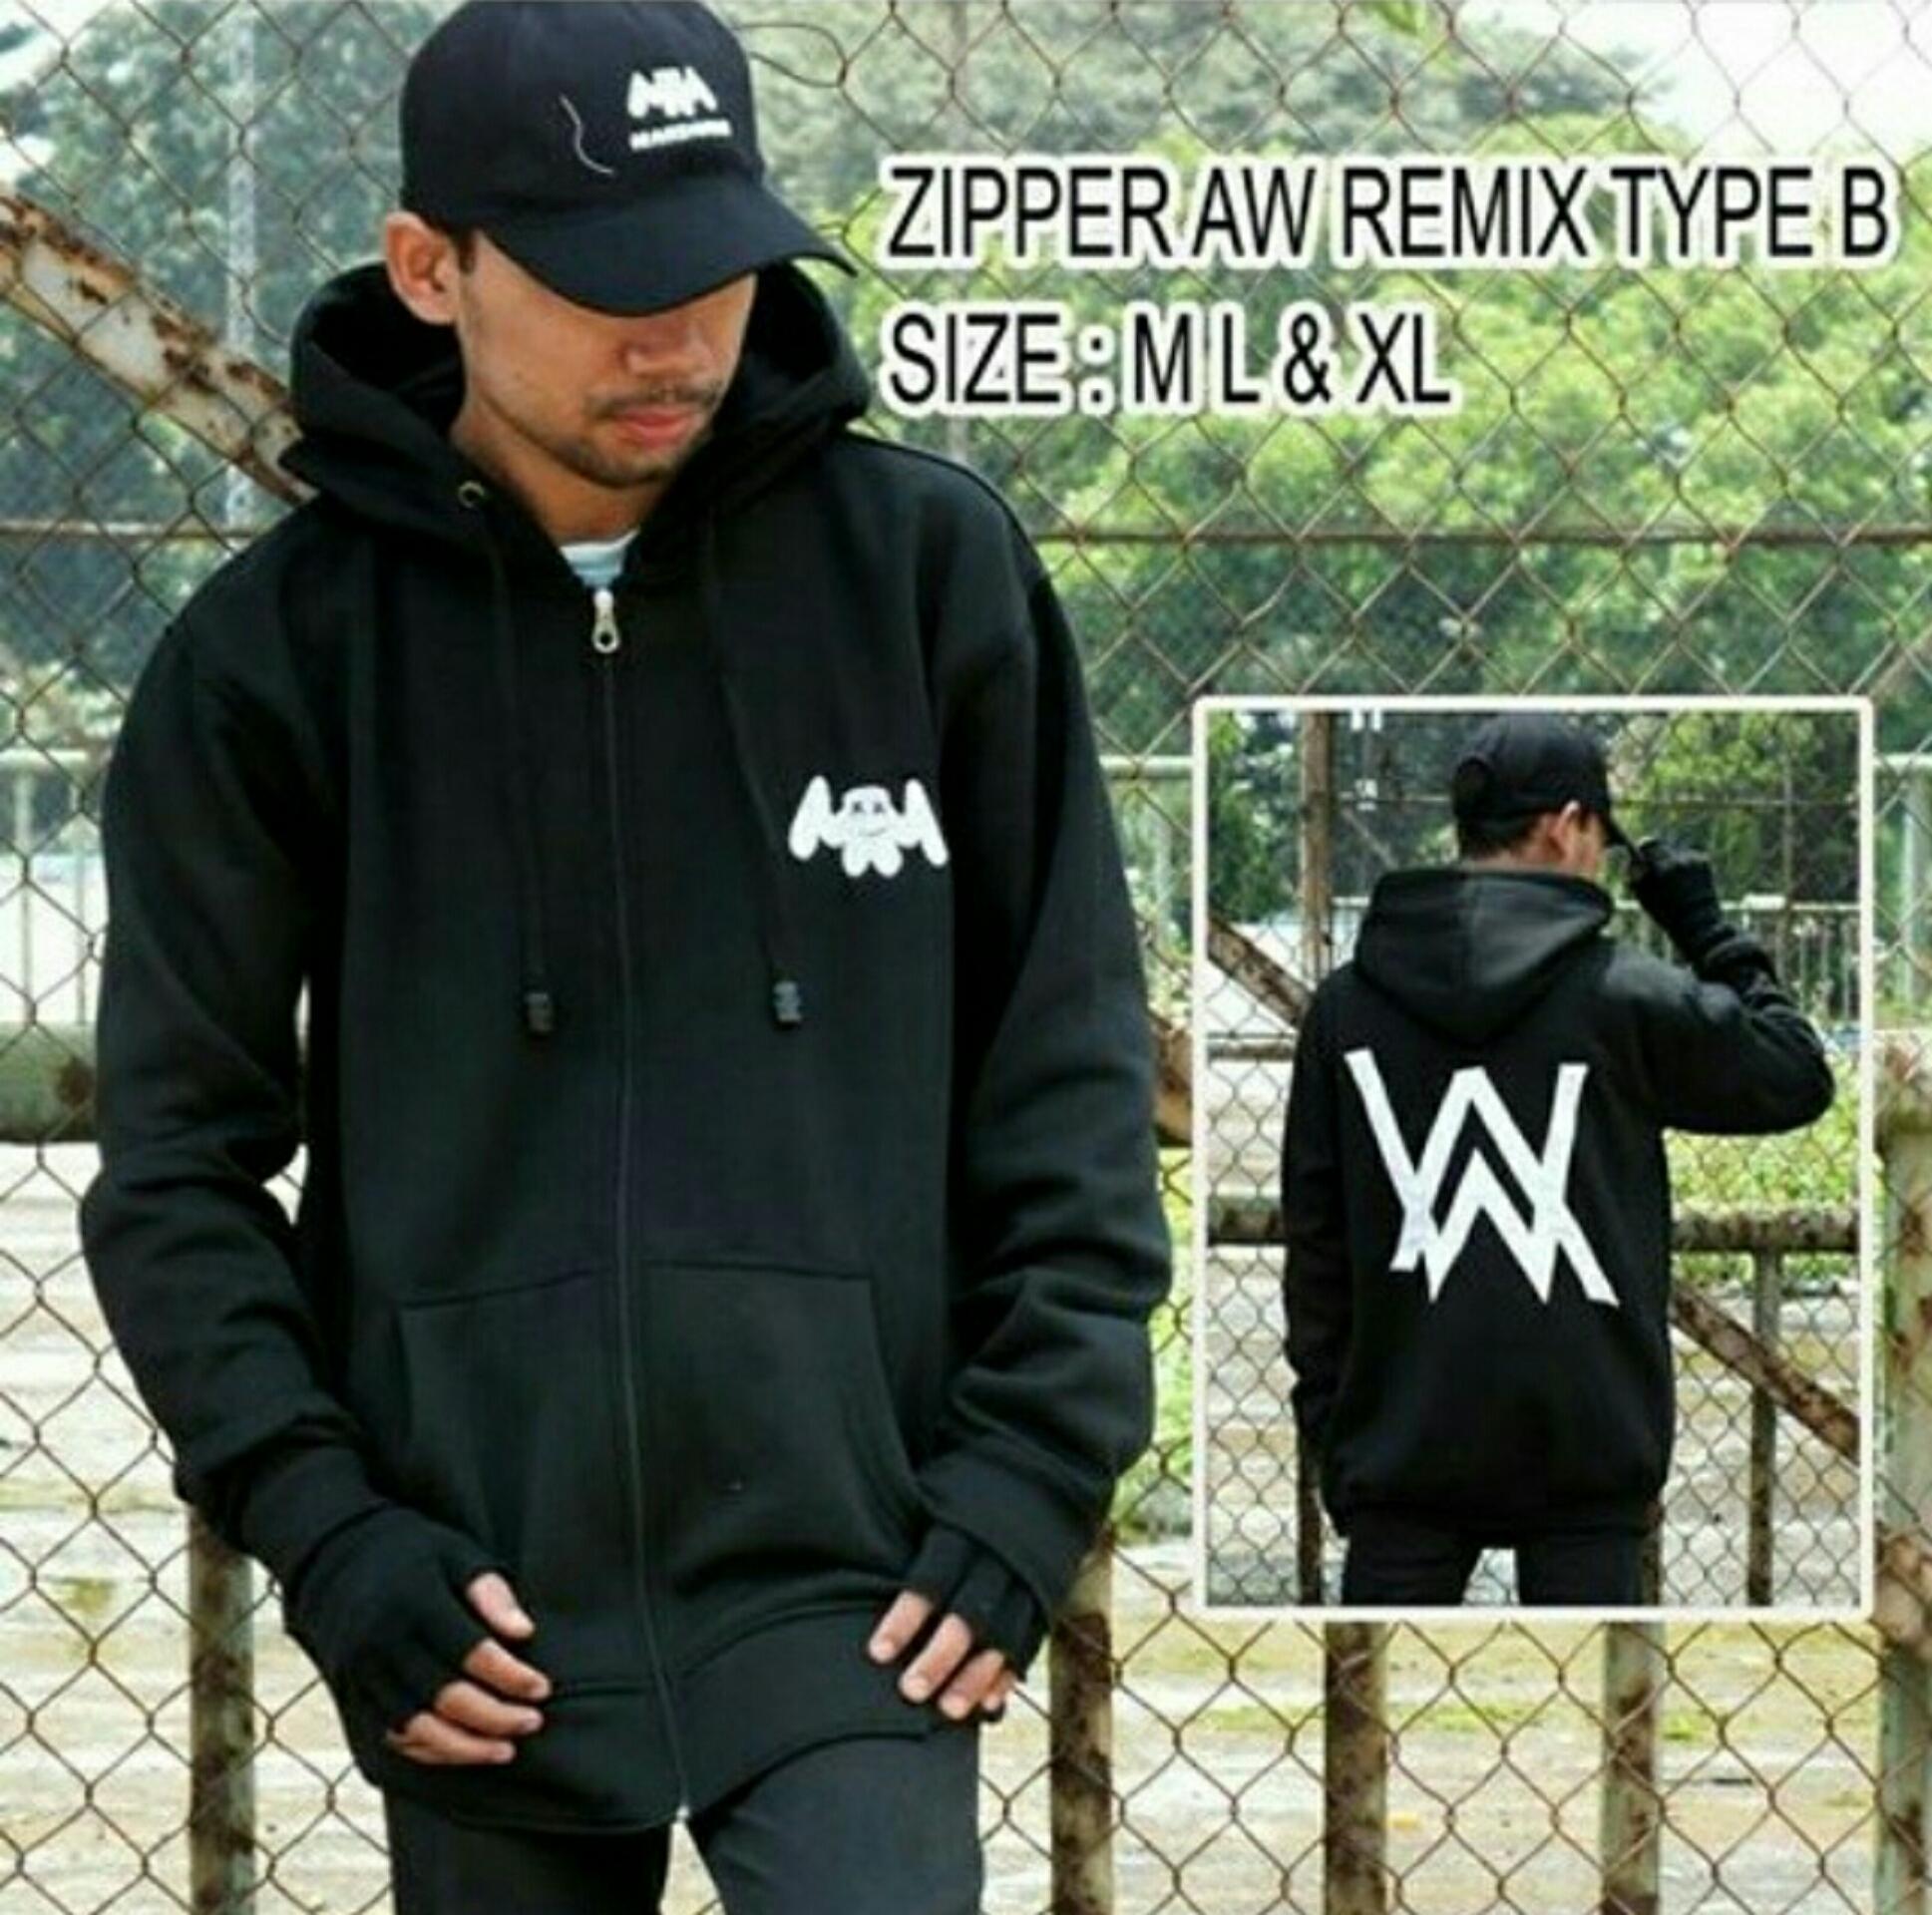 Jual Jaket Alan Walker Remix Pria Wanita Rc Jacket Tokopedia Sweater Dj Zipper